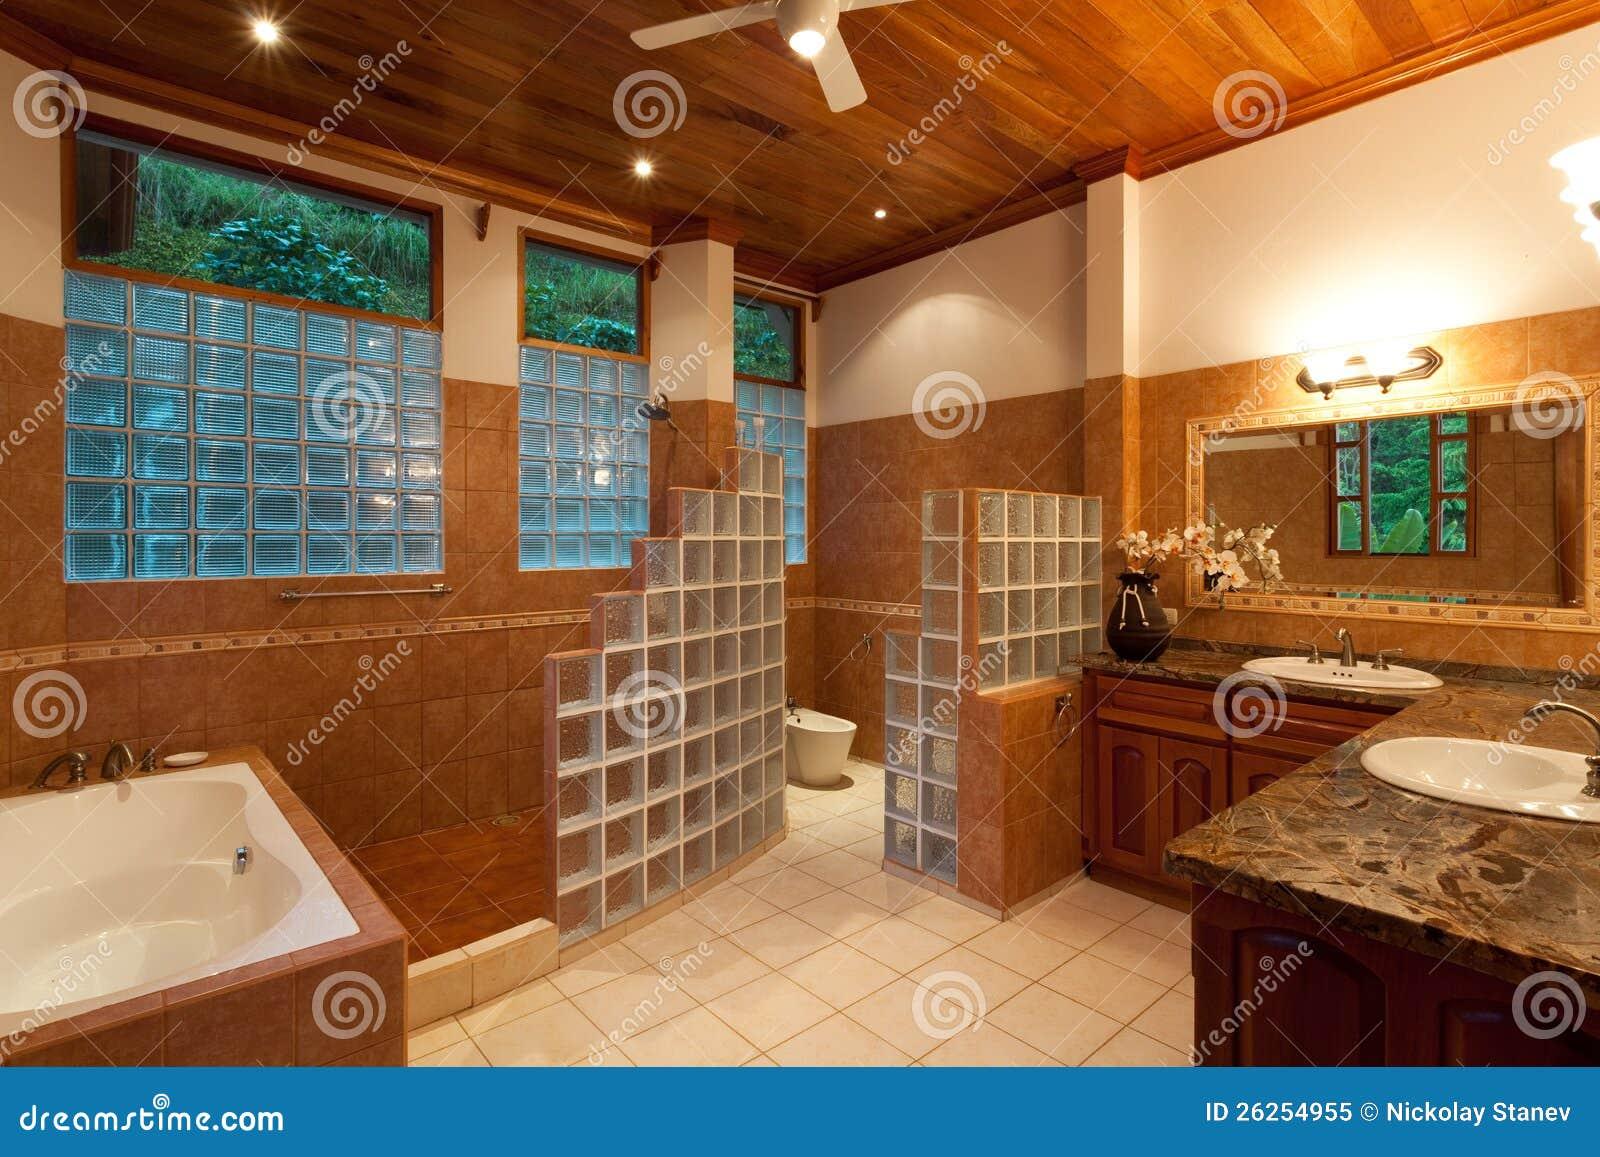 gro es modernes badezimmer lizenzfreies stockfoto bild. Black Bedroom Furniture Sets. Home Design Ideas